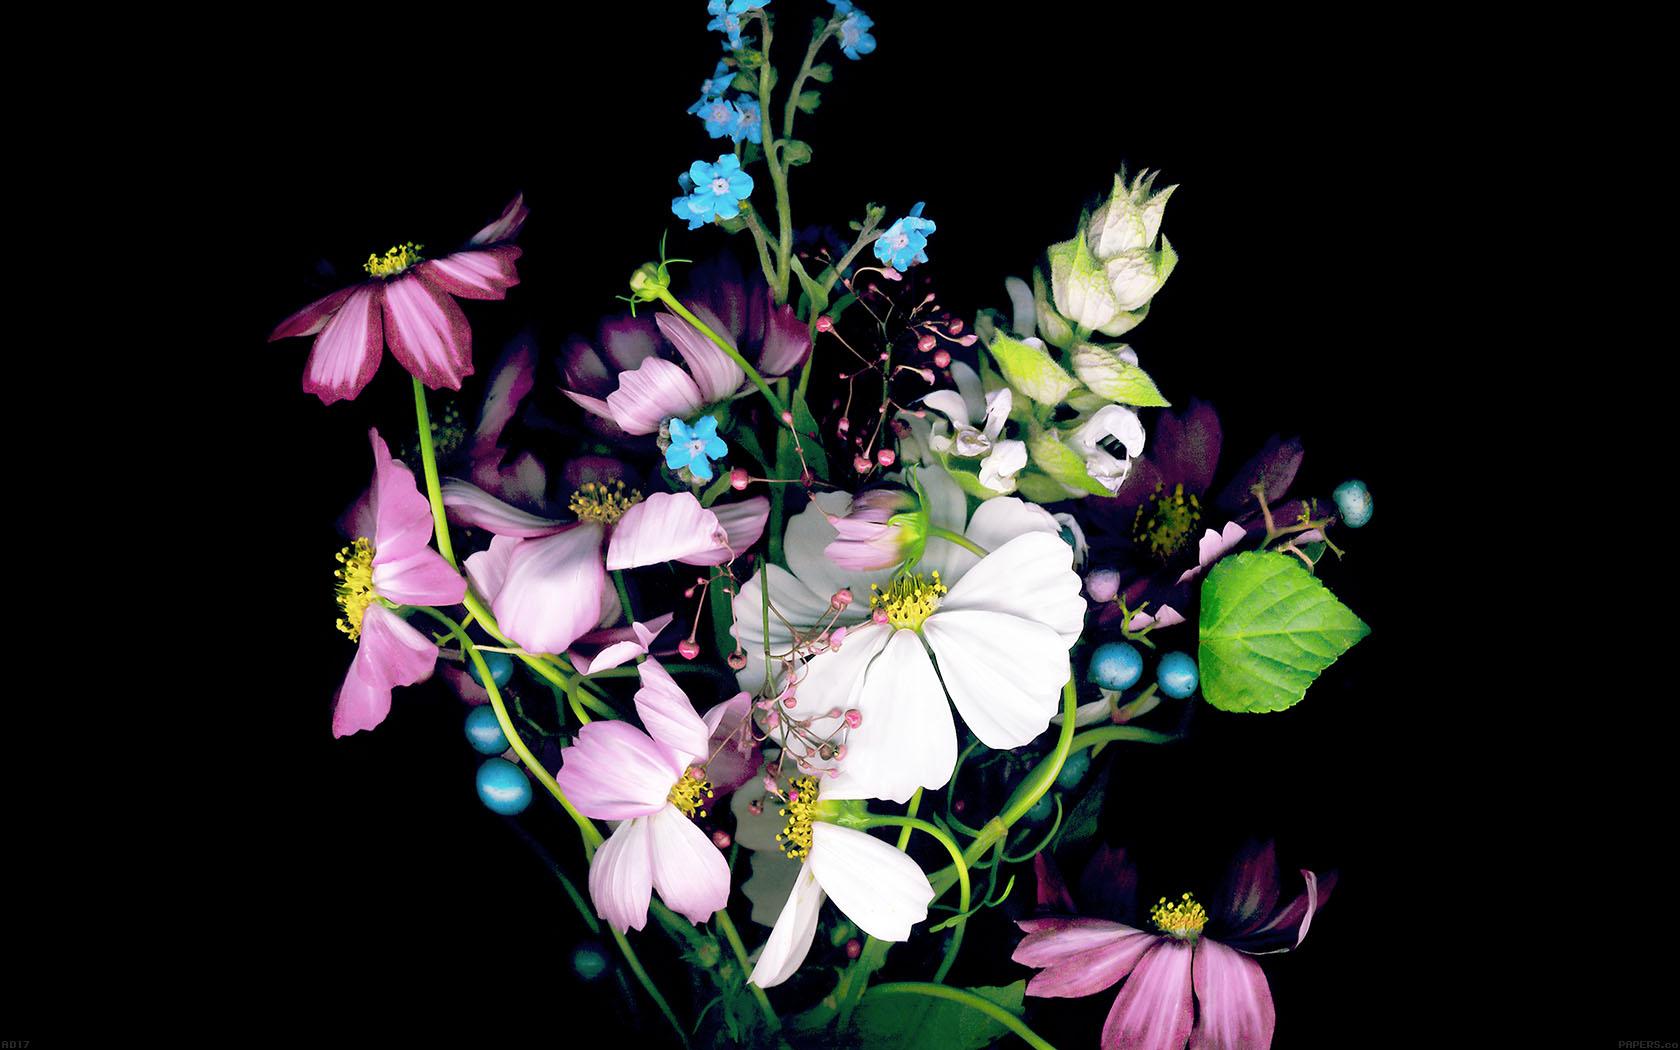 Ad17-wallpaper-apple-ios8-iphone6-small-dark-flower